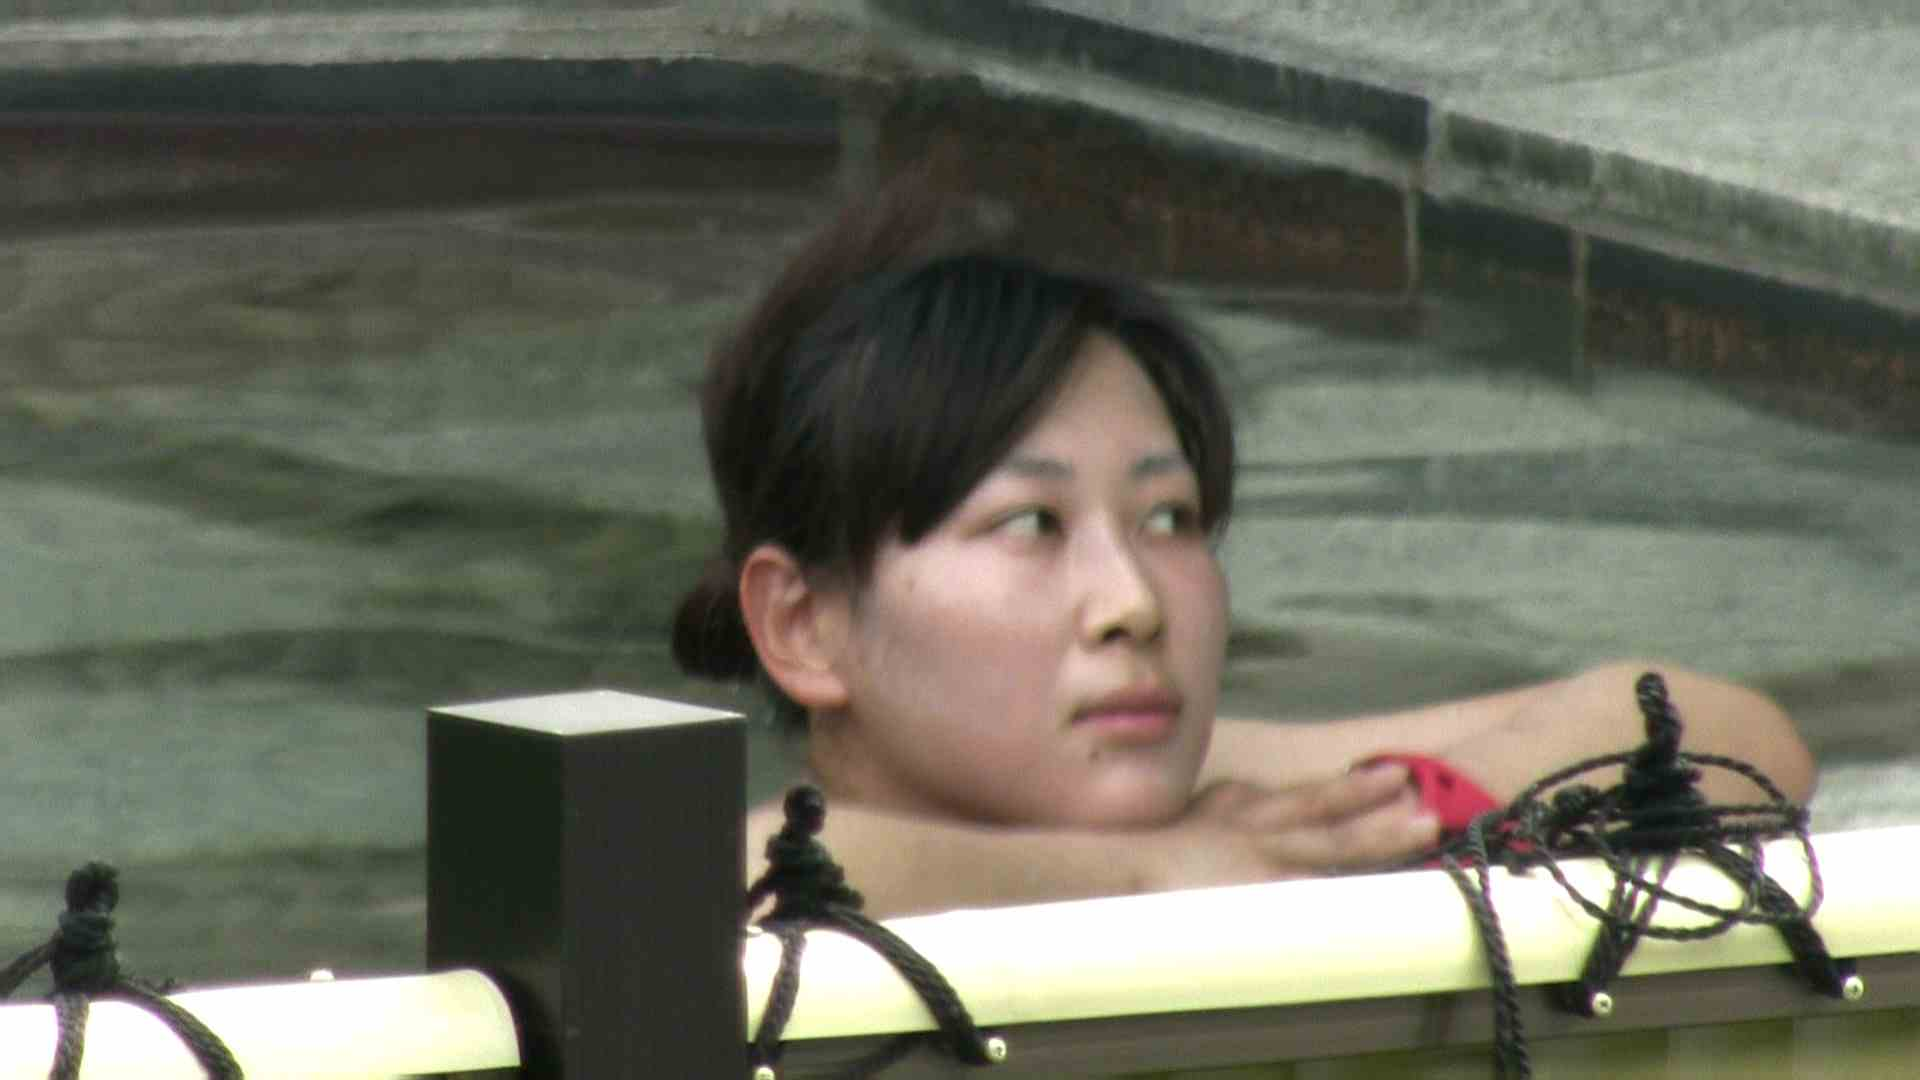 Aquaな露天風呂Vol.665 HなOL   盗撮  104pic 84